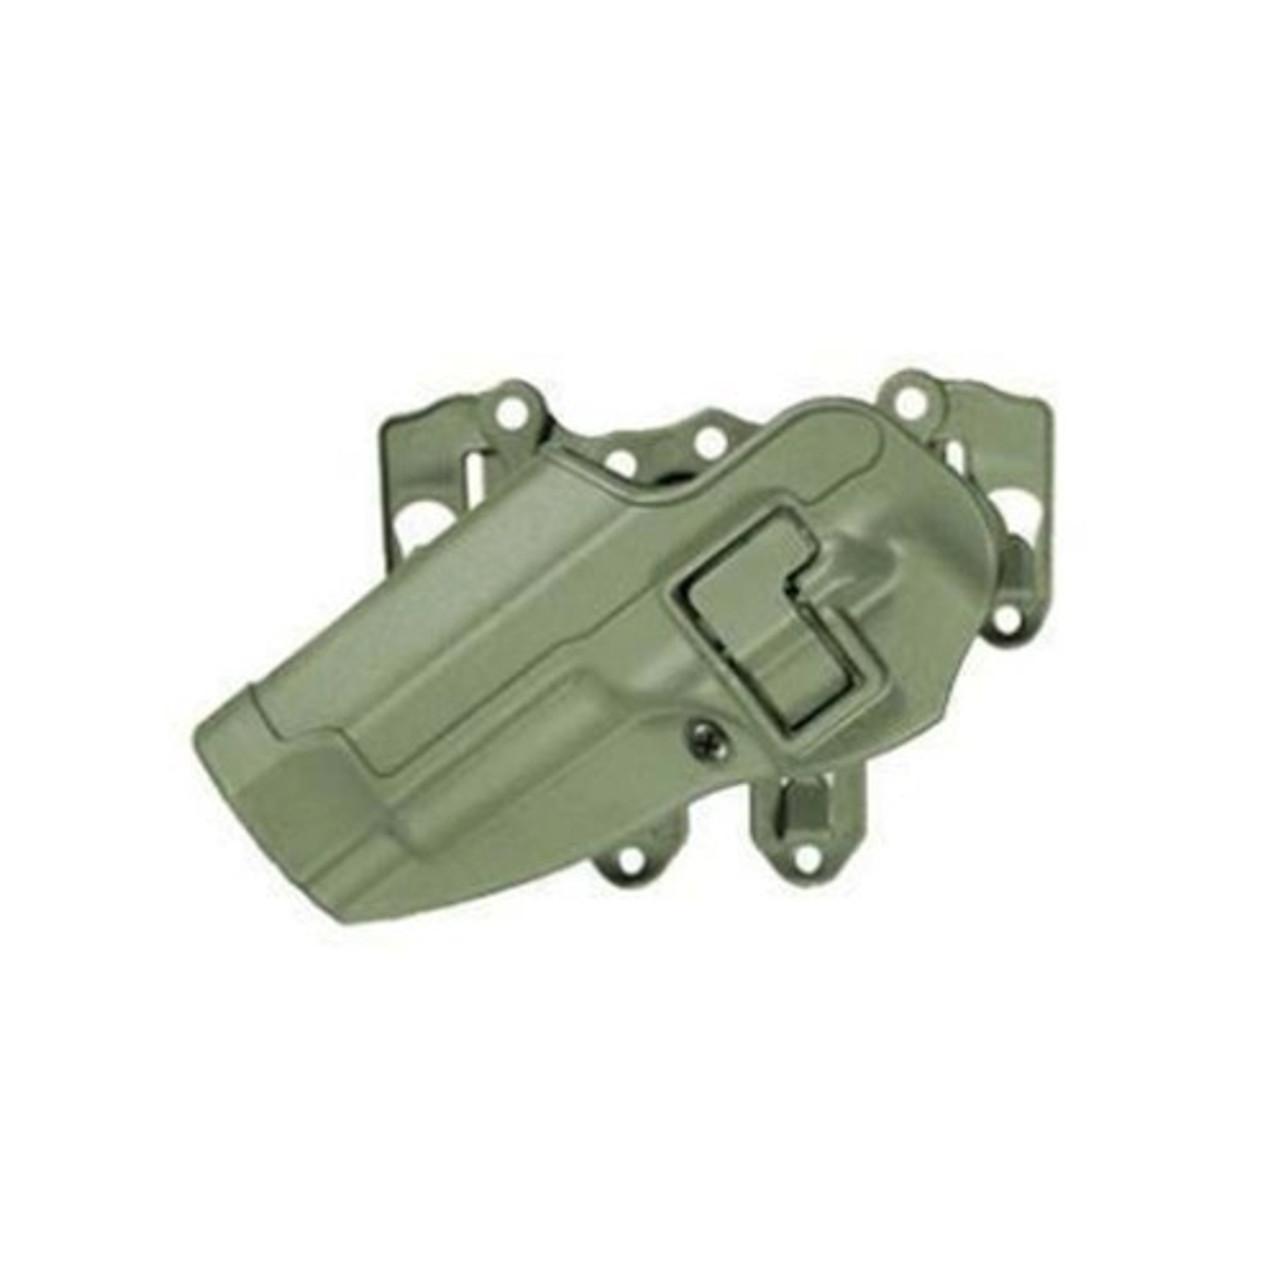 BLACKHAWK 40CL01OD S.T.R.I.K.E.® PLATFORM WITH SERPA® HOLSTER, BERETTA ONLY, Ambidextrous adapter platform, Olive Drab